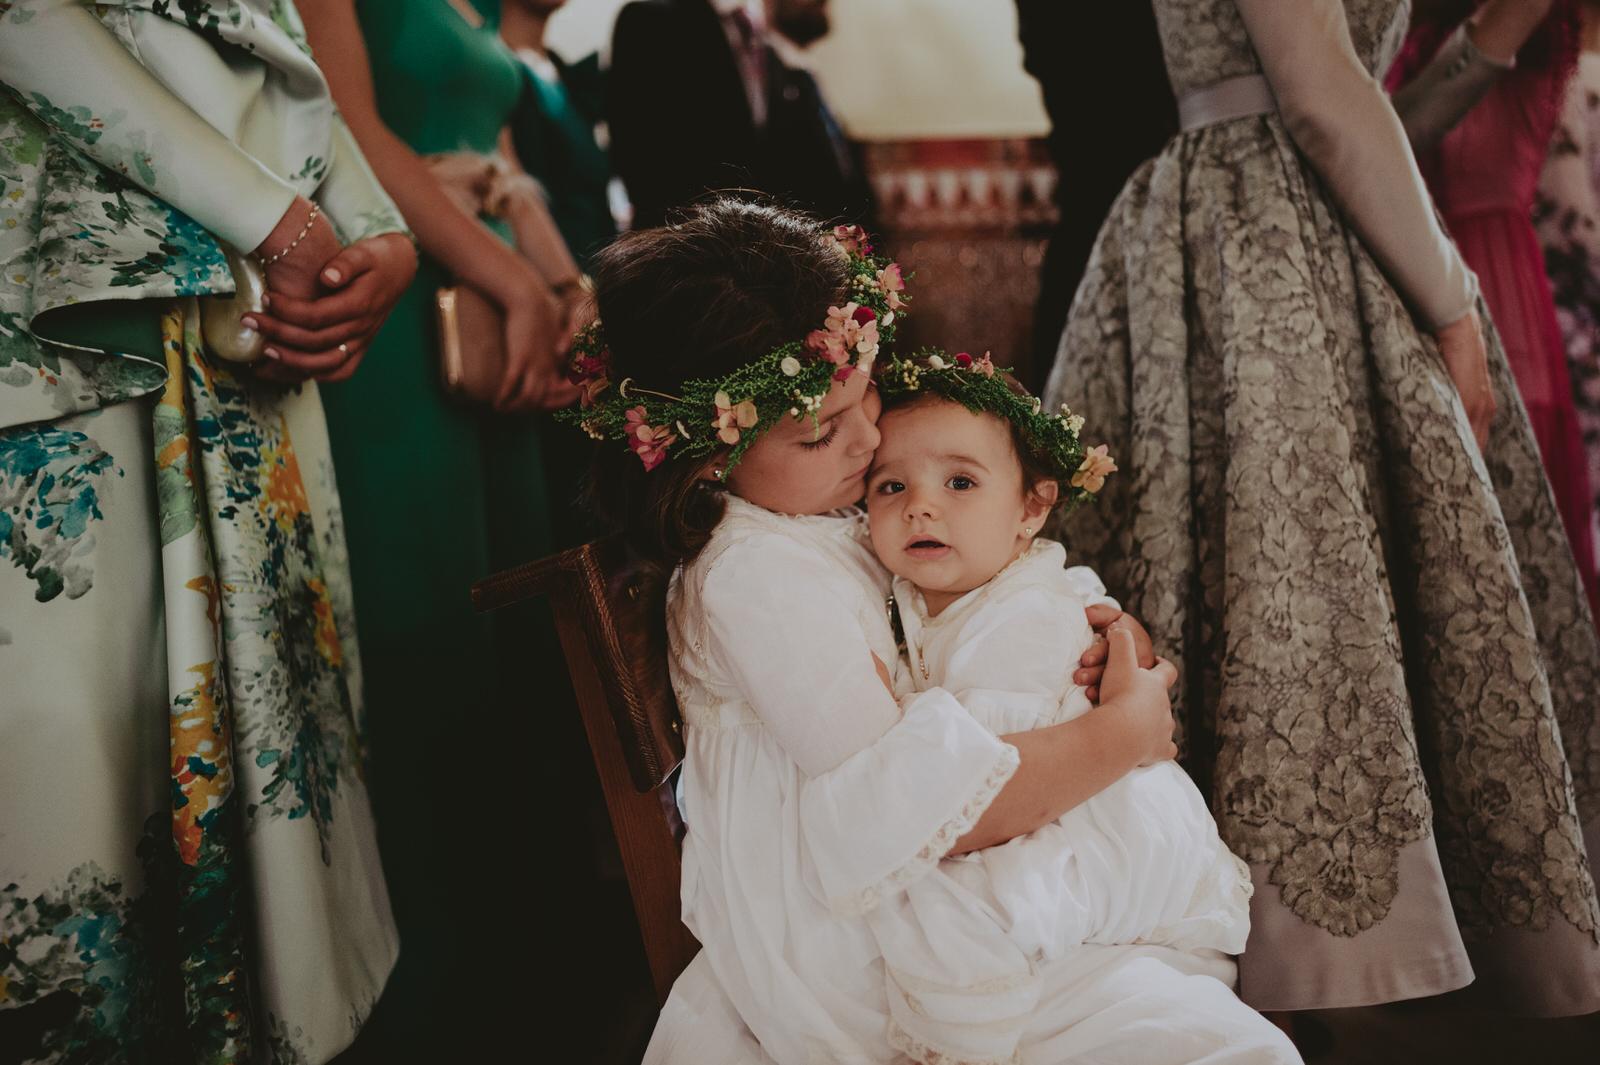 Judith & Gabriel - Boda en Olivares - Albaida, Fotógrafo de boda Andrés Amarillo - 32.JPG